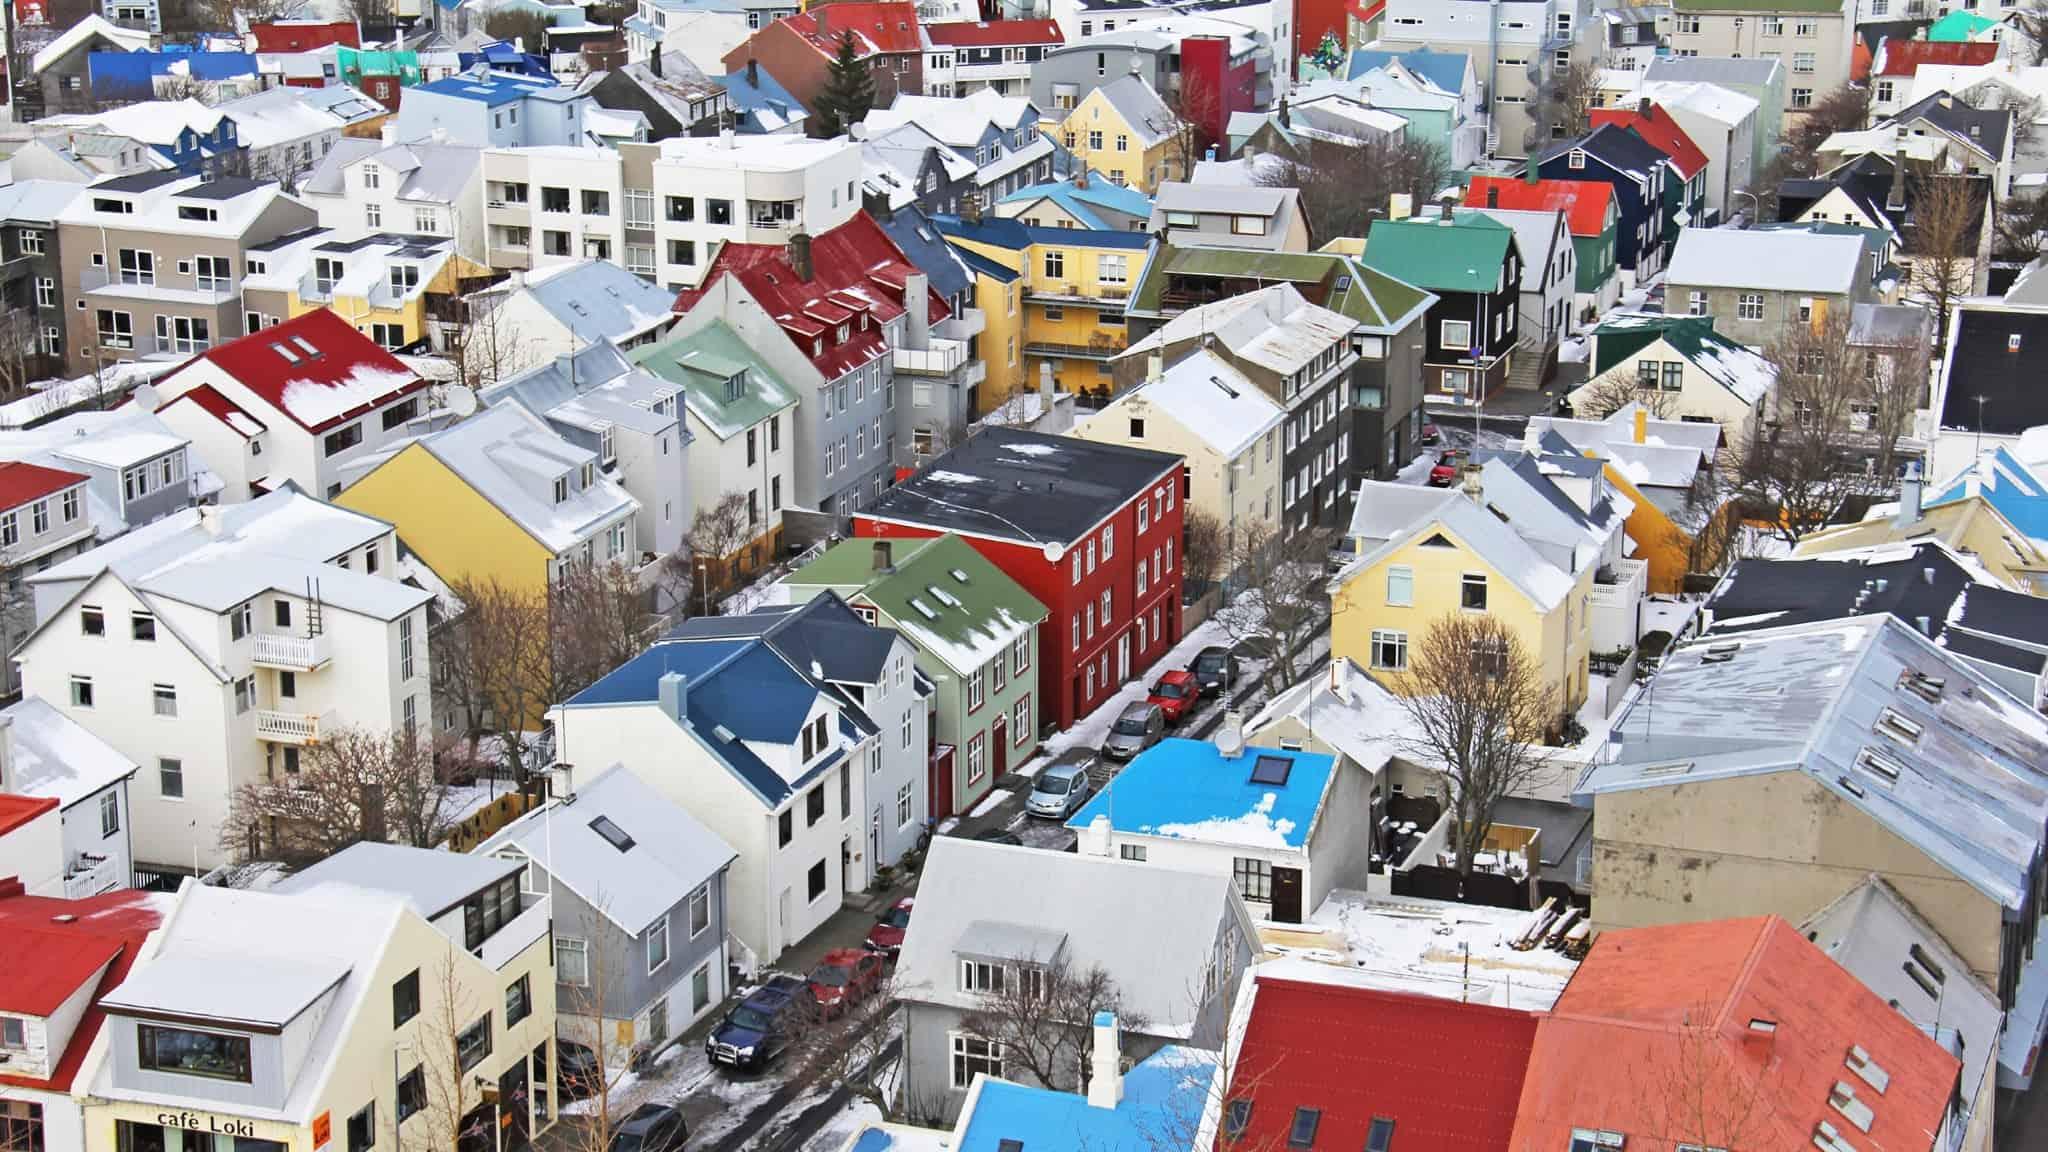 Reykjavik Most Beautiful Cities in Europe